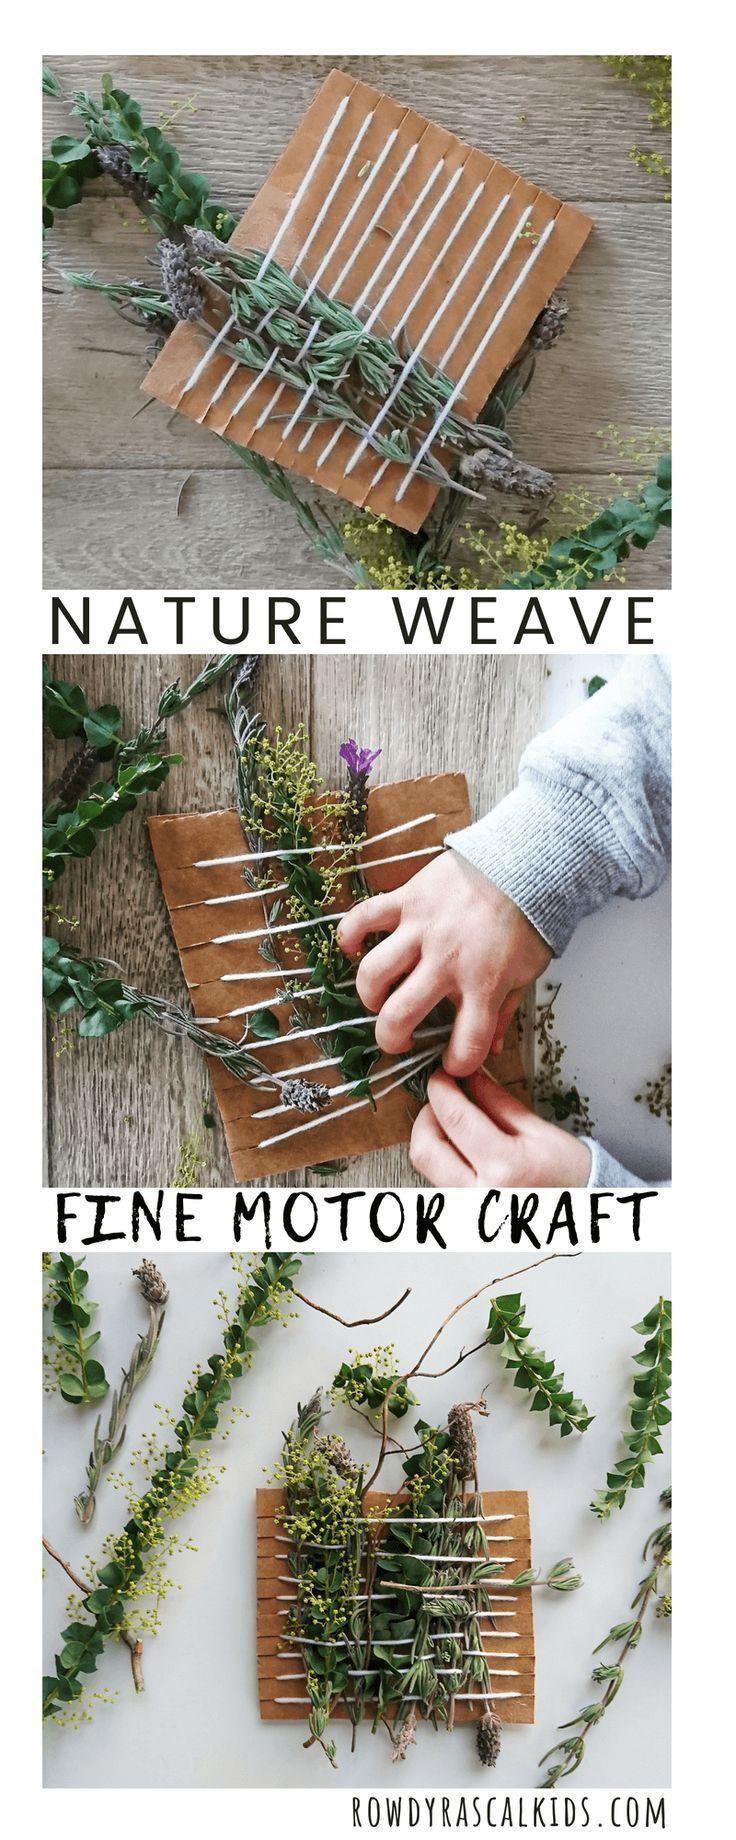 9. August Simple Nature Weave für Kinder #weaving